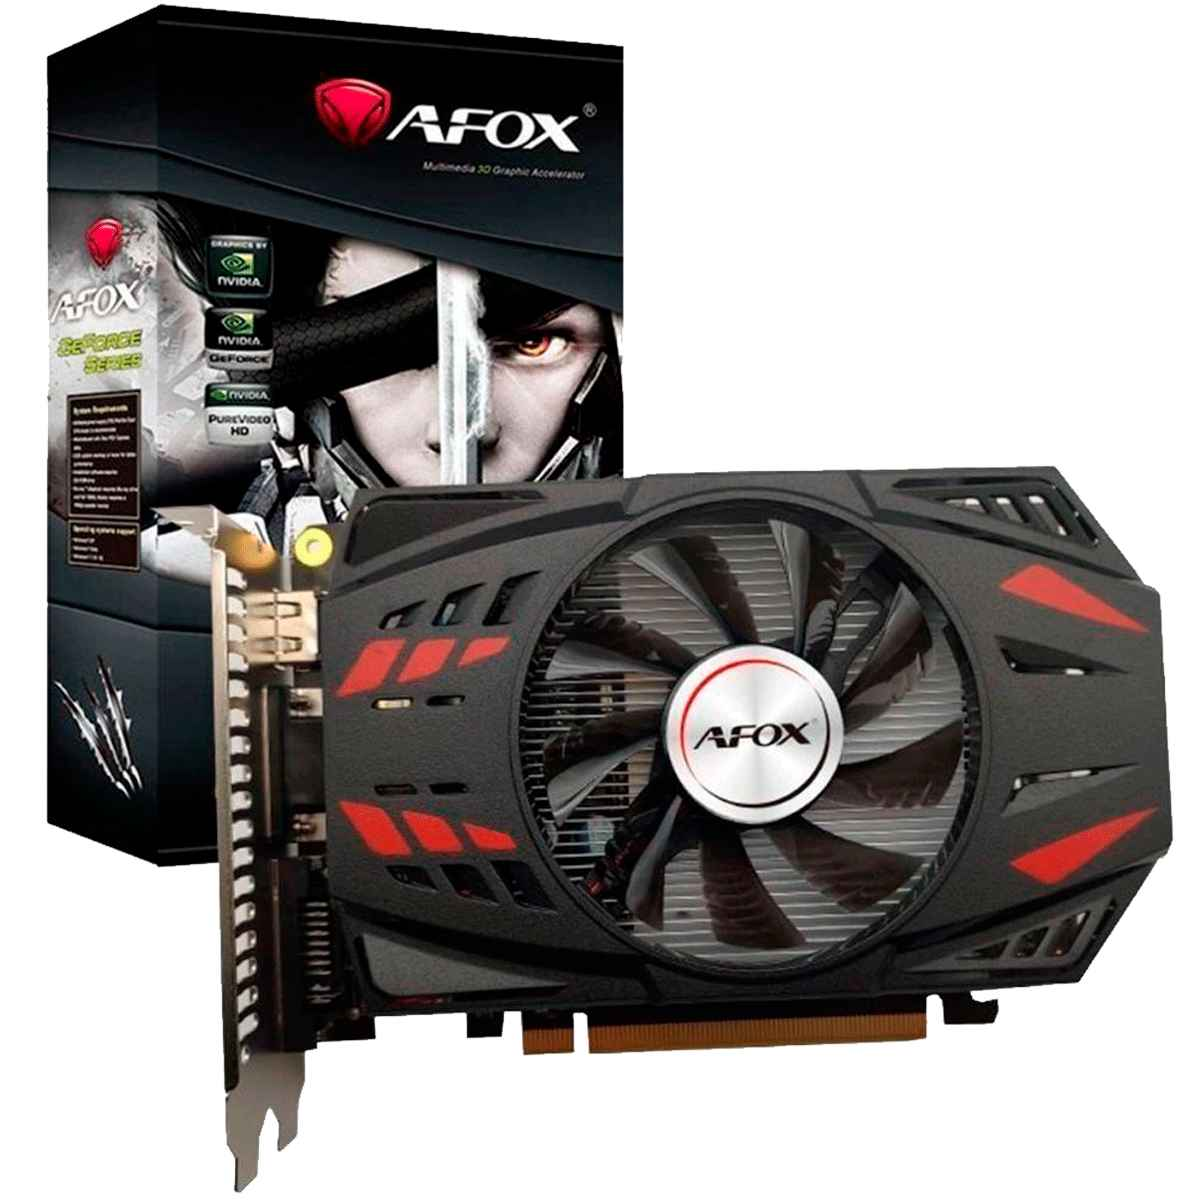 Placa de vídeo  AFOX  GTX 750TI 2GB GDDR5  - Fatality